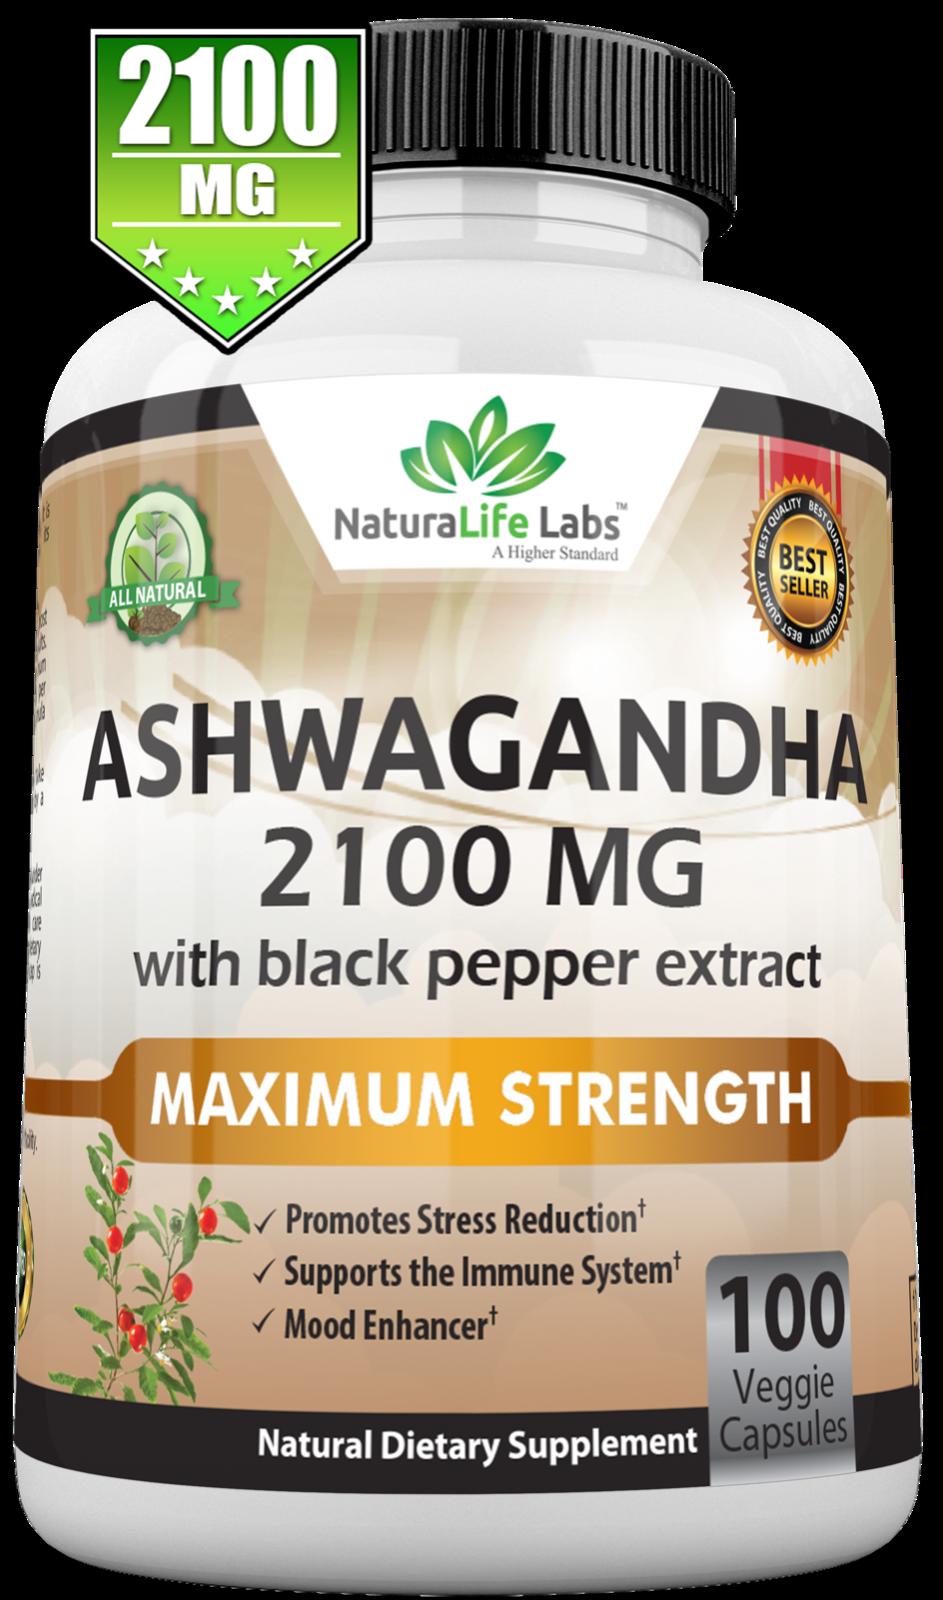 Organic Ashwagandha 2100mg - 100 vegan capsules 100% Pure Organic